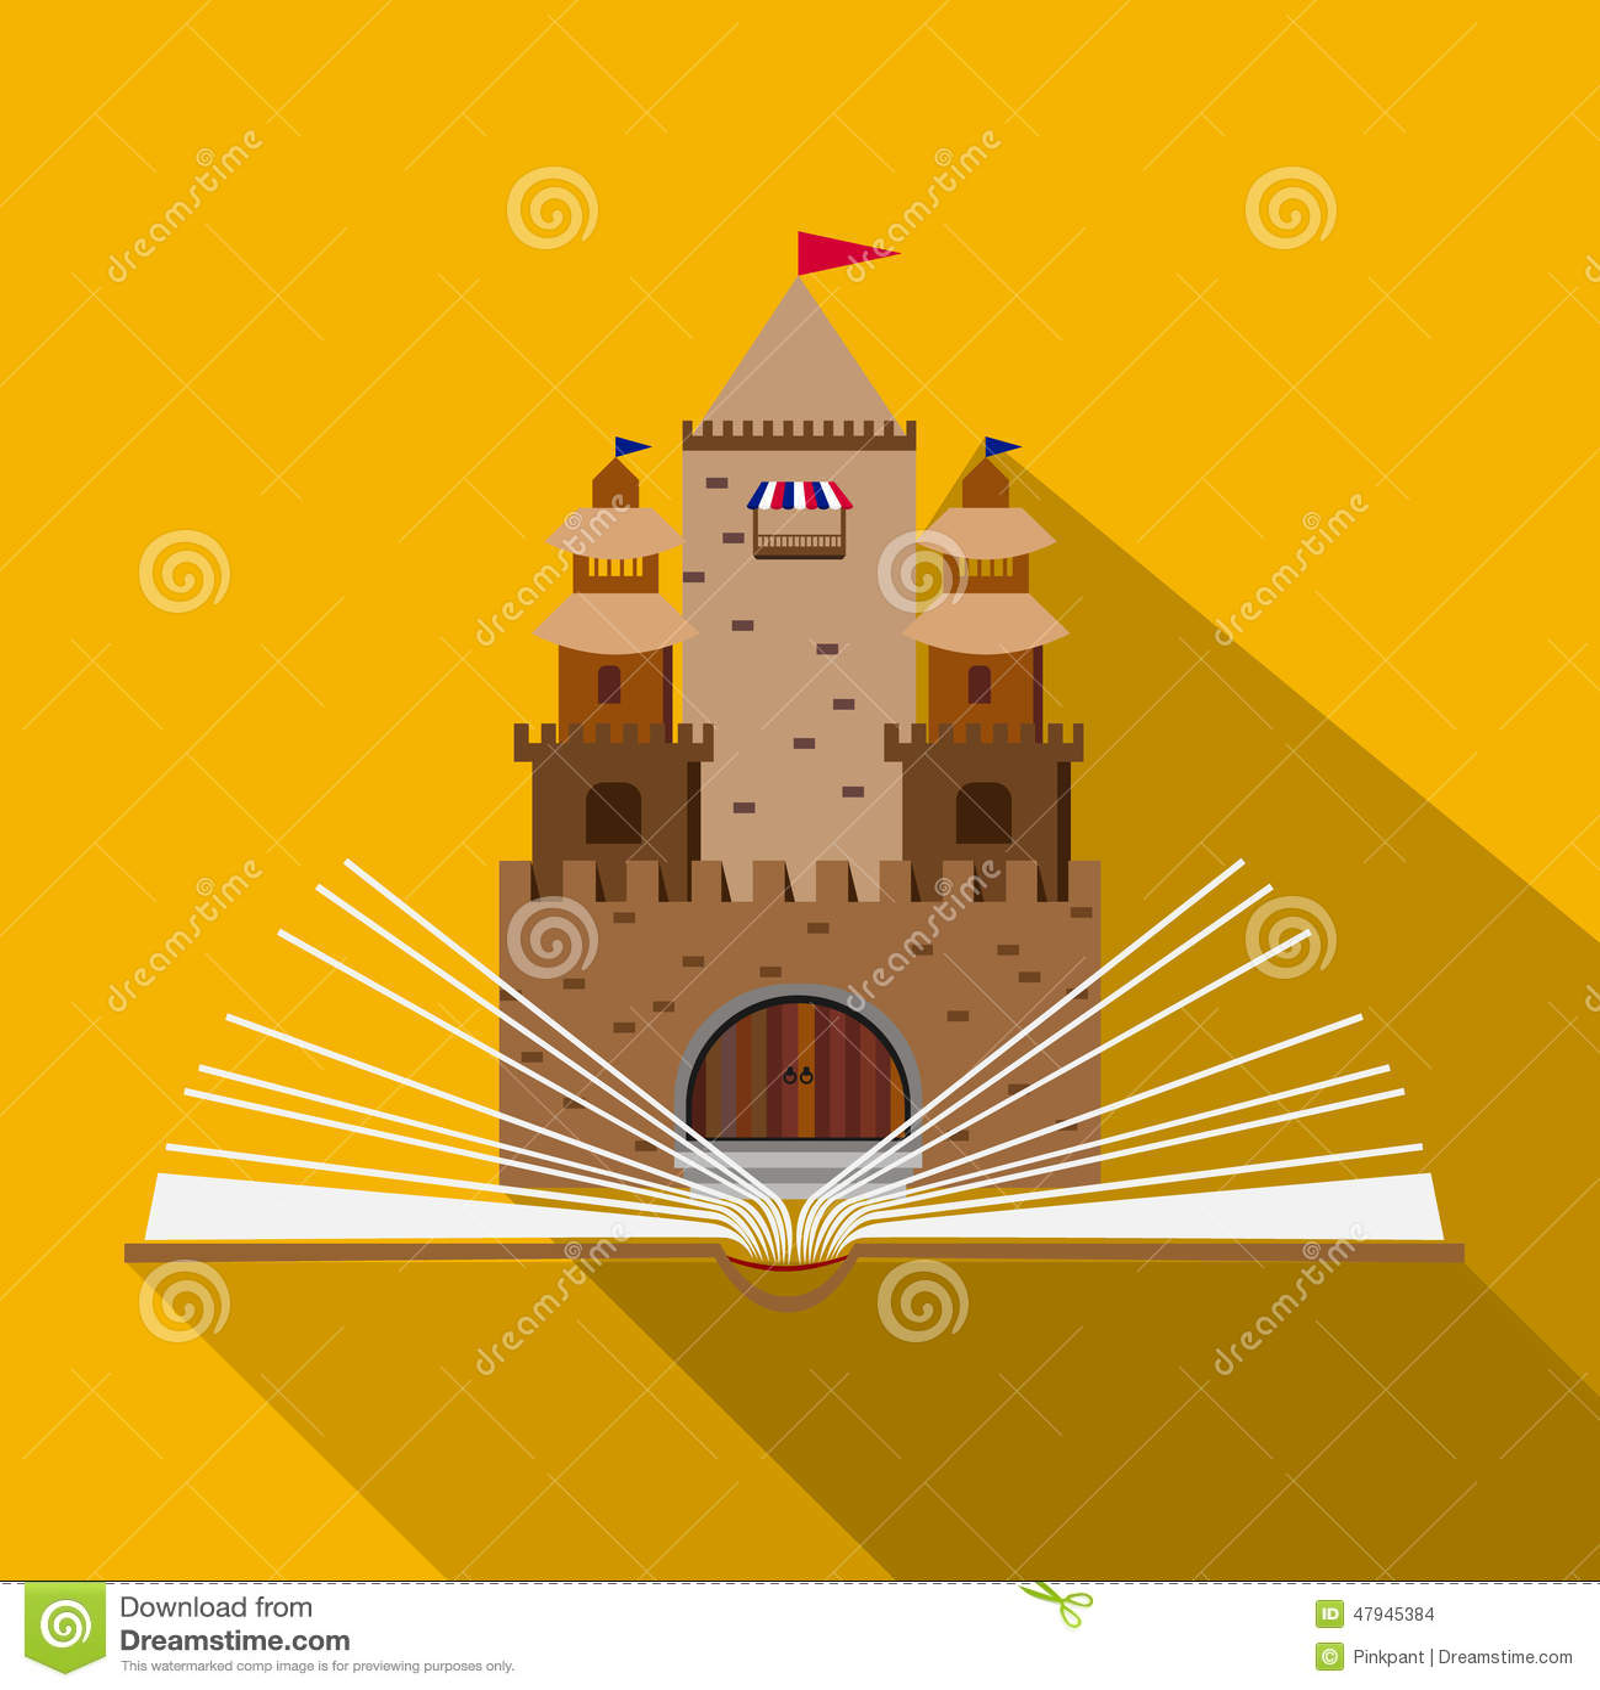 castle design flat stock vector - image: 70087397